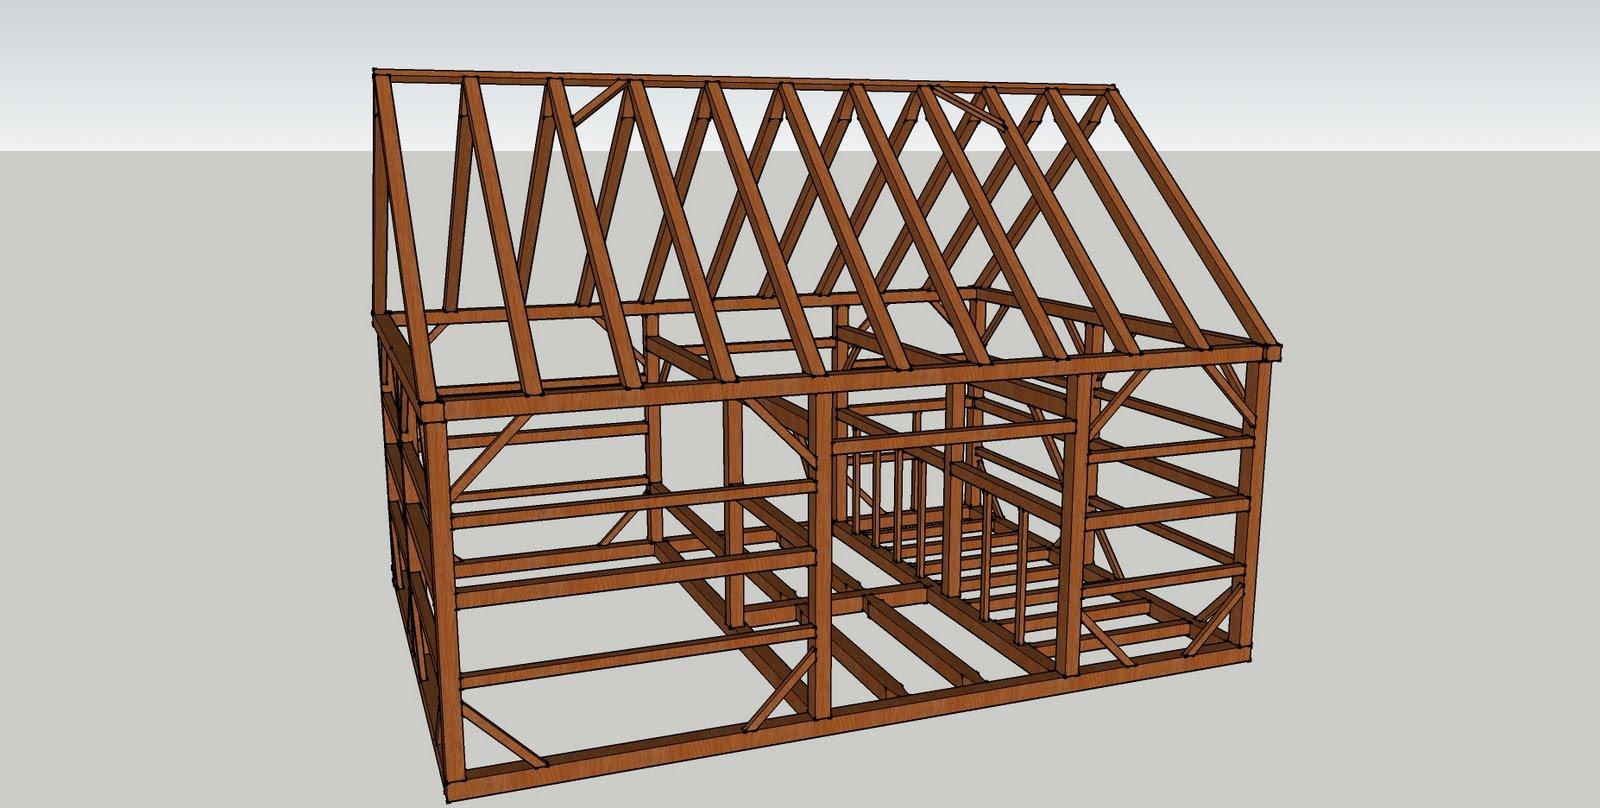 The S.B.F. Abbot frame.